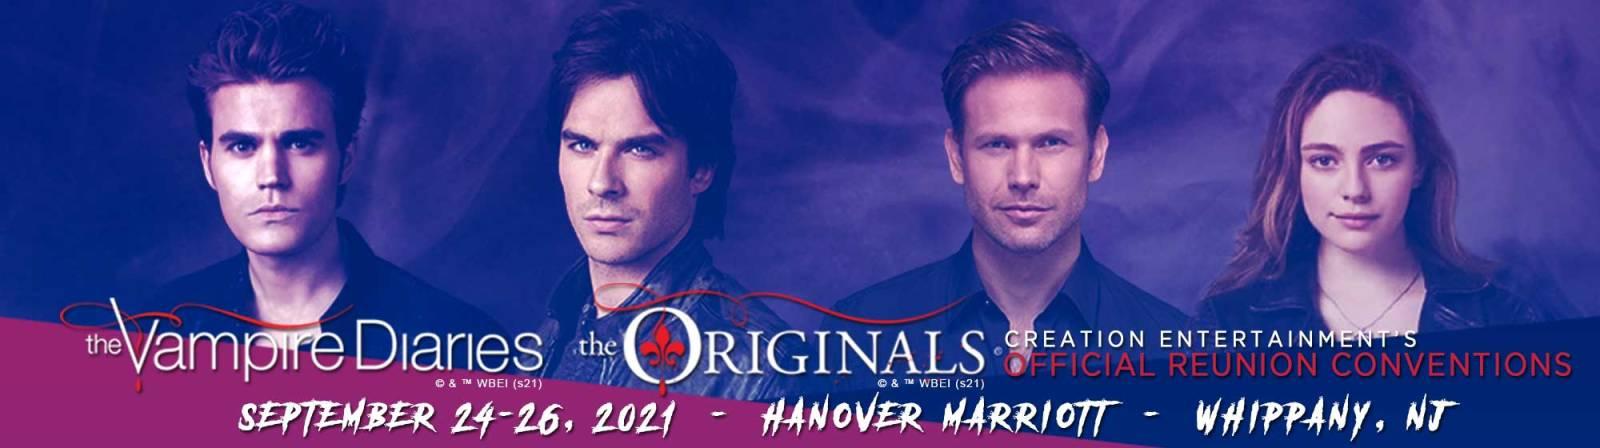 The Vampire Diaries Cast Reunion 2021